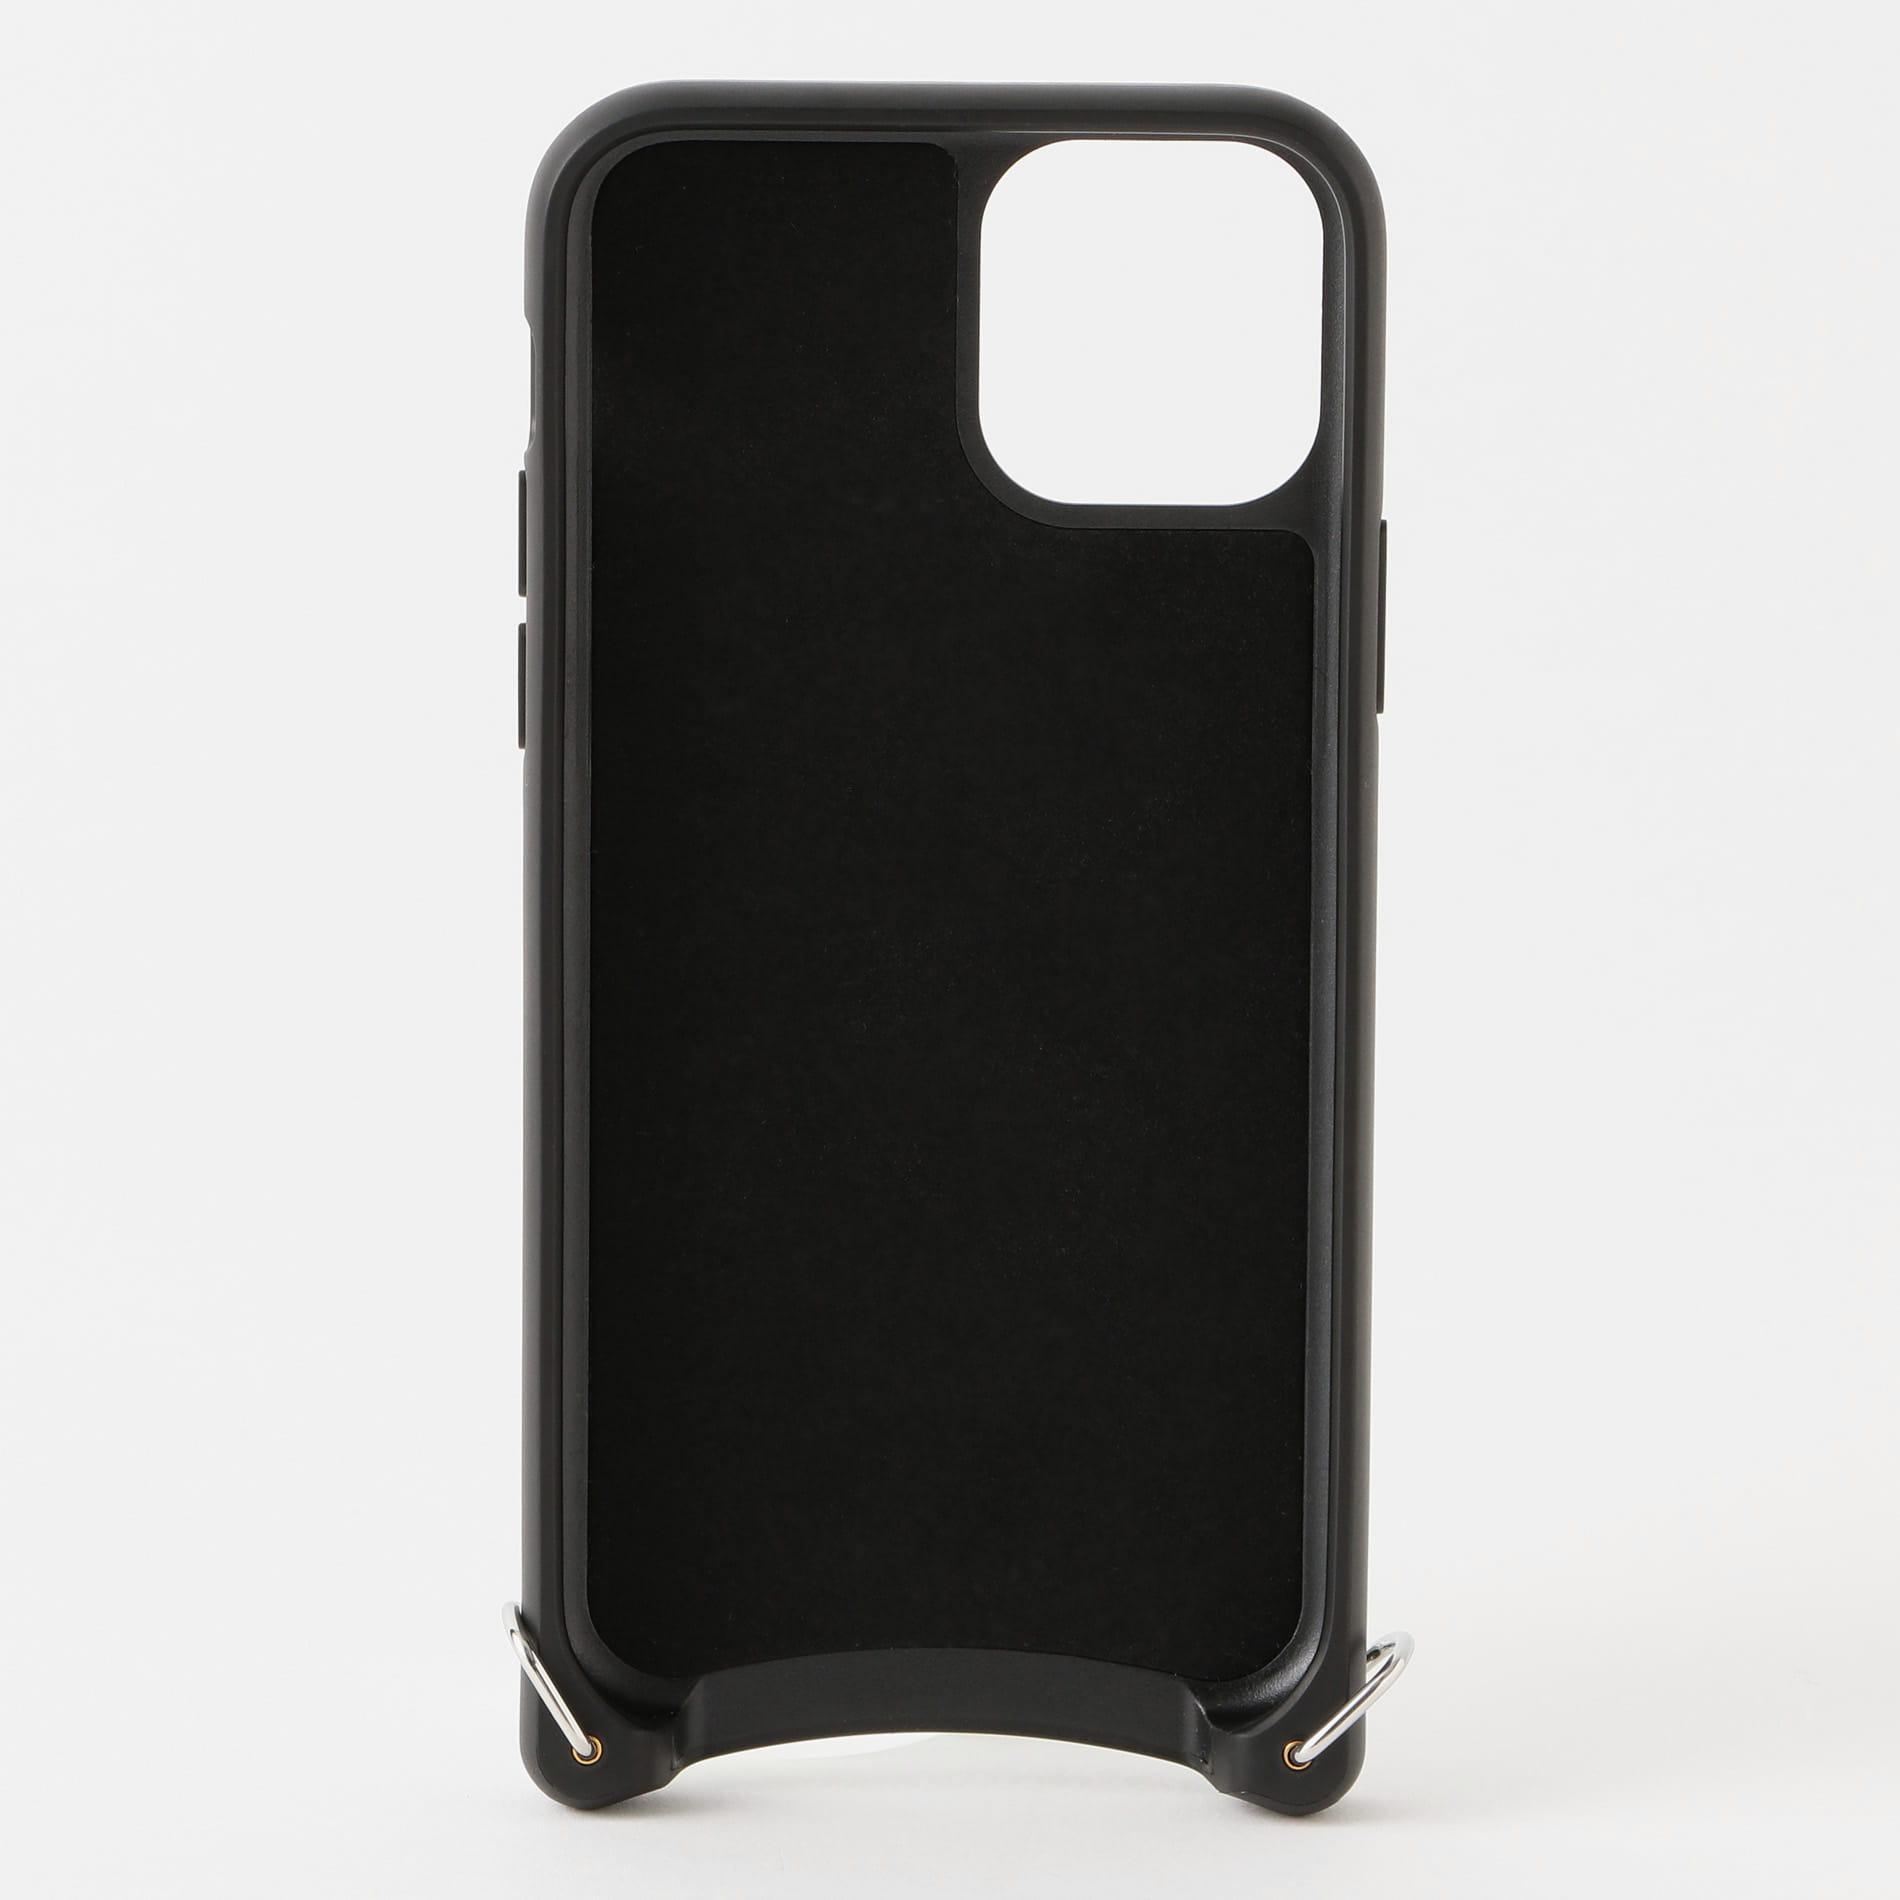 【BANDOLIER】NICOLE MIST GREEN iPhone 11 Pro bdl05-10nic-migrn-11p